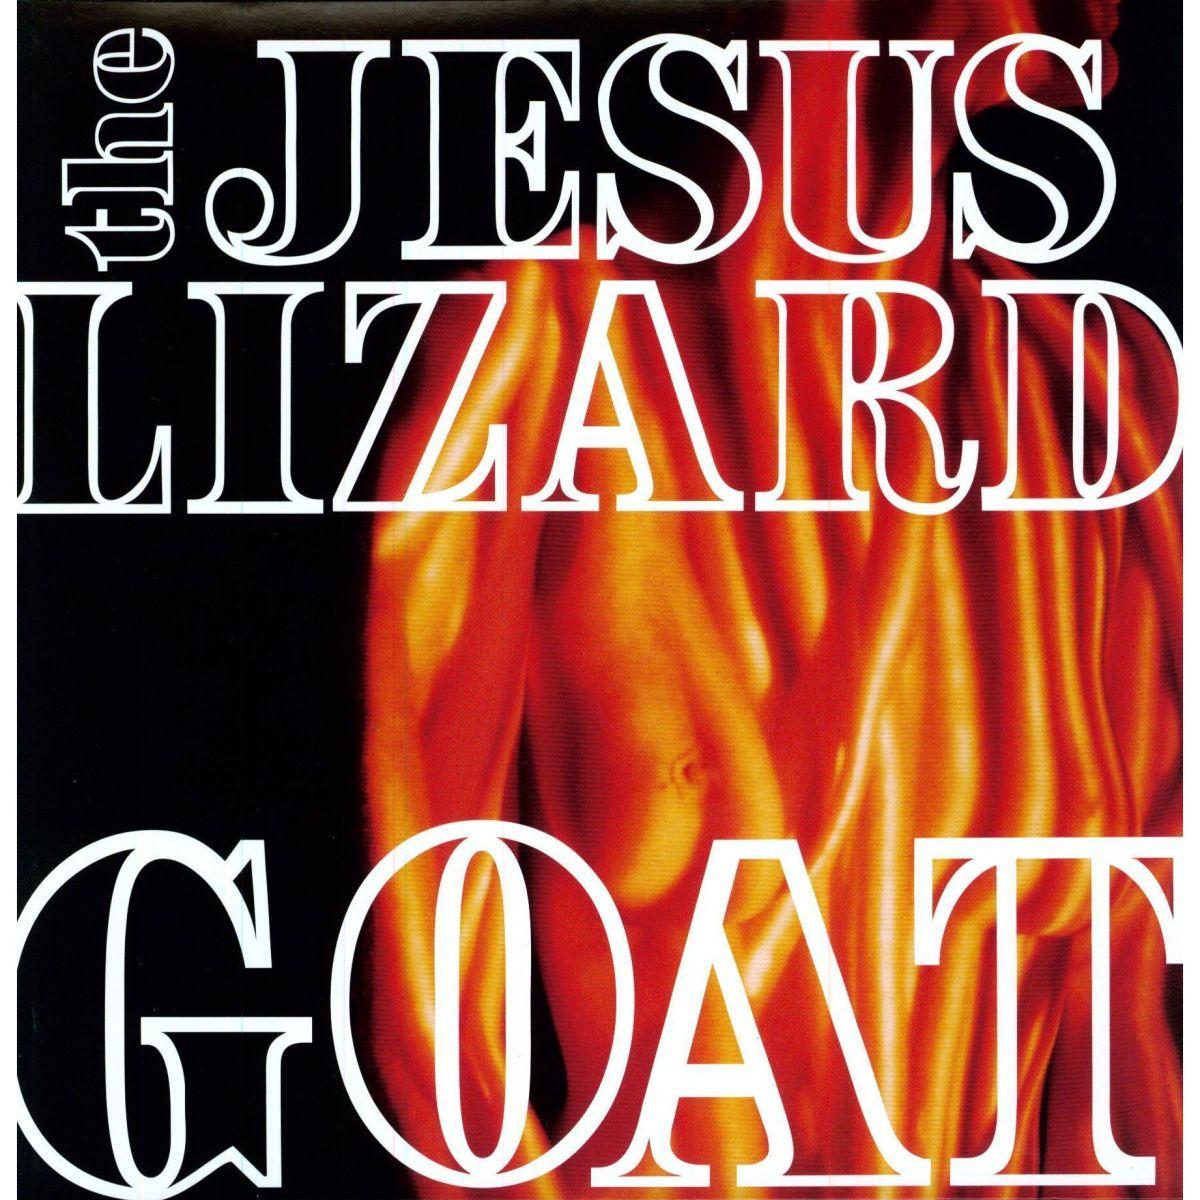 The Jesus Lizard Goat Album Review